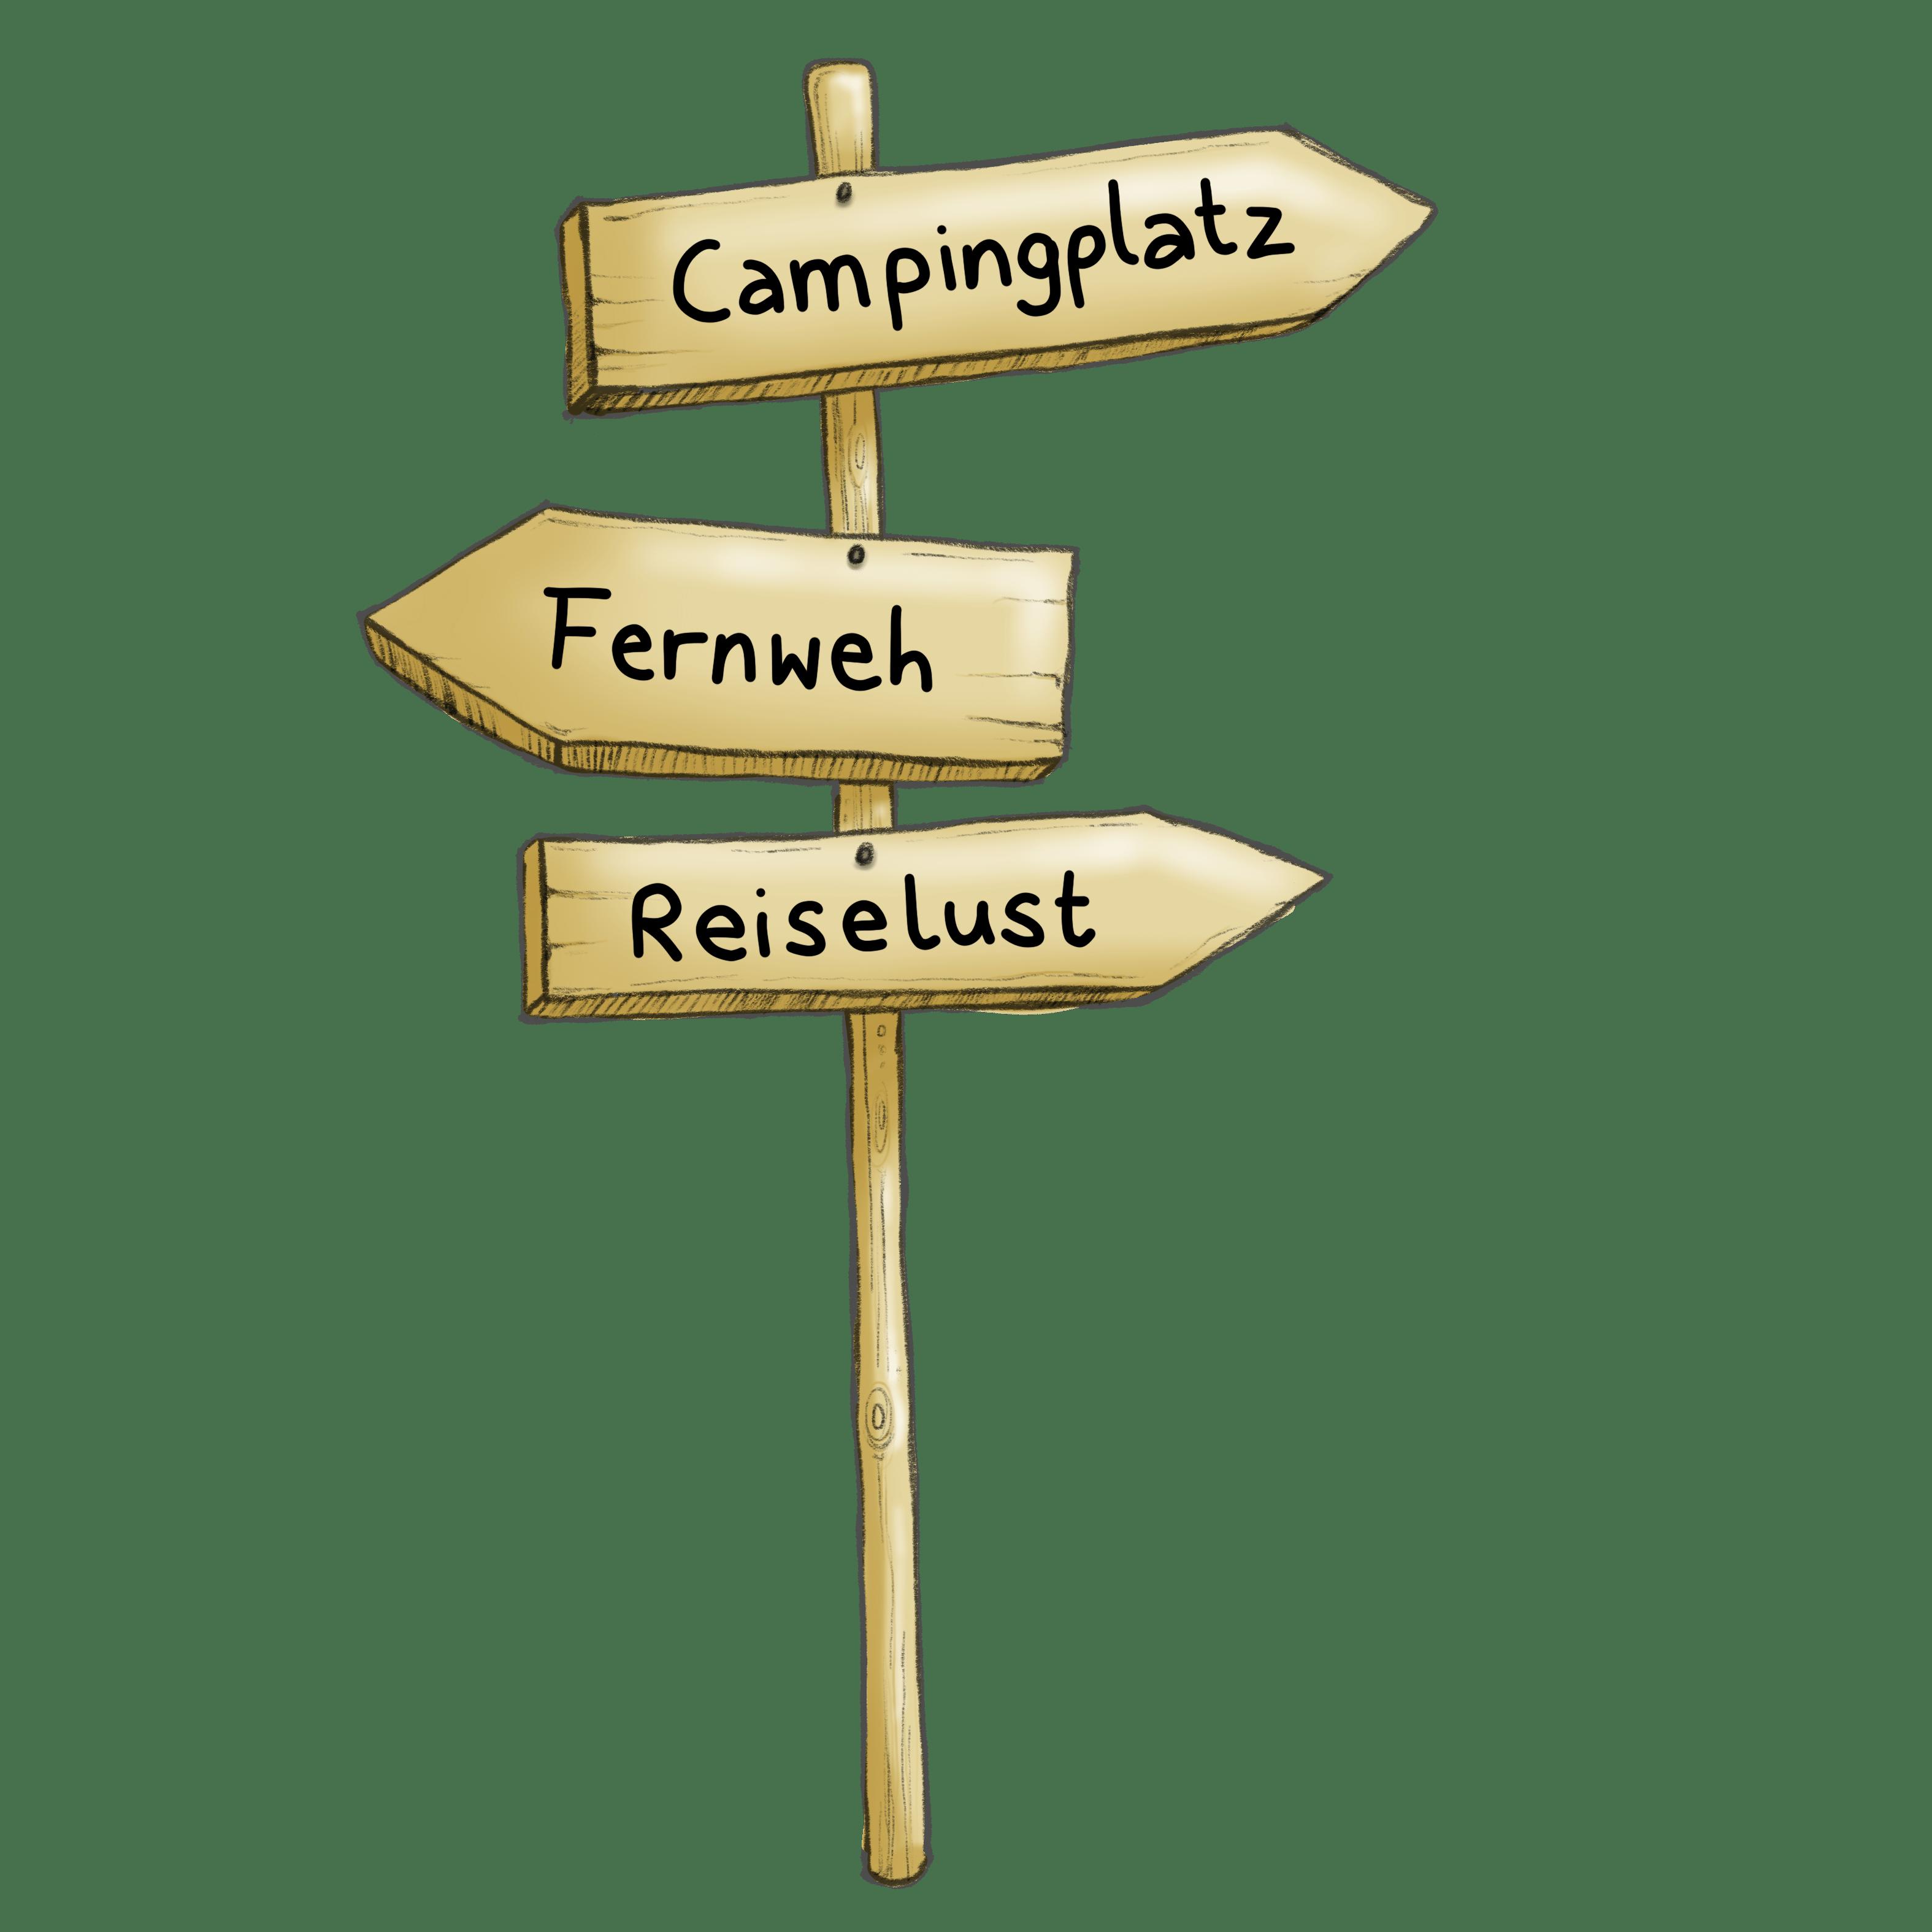 Entdecke mit uns die bunter Campingwelt, Campingspiele & Memos